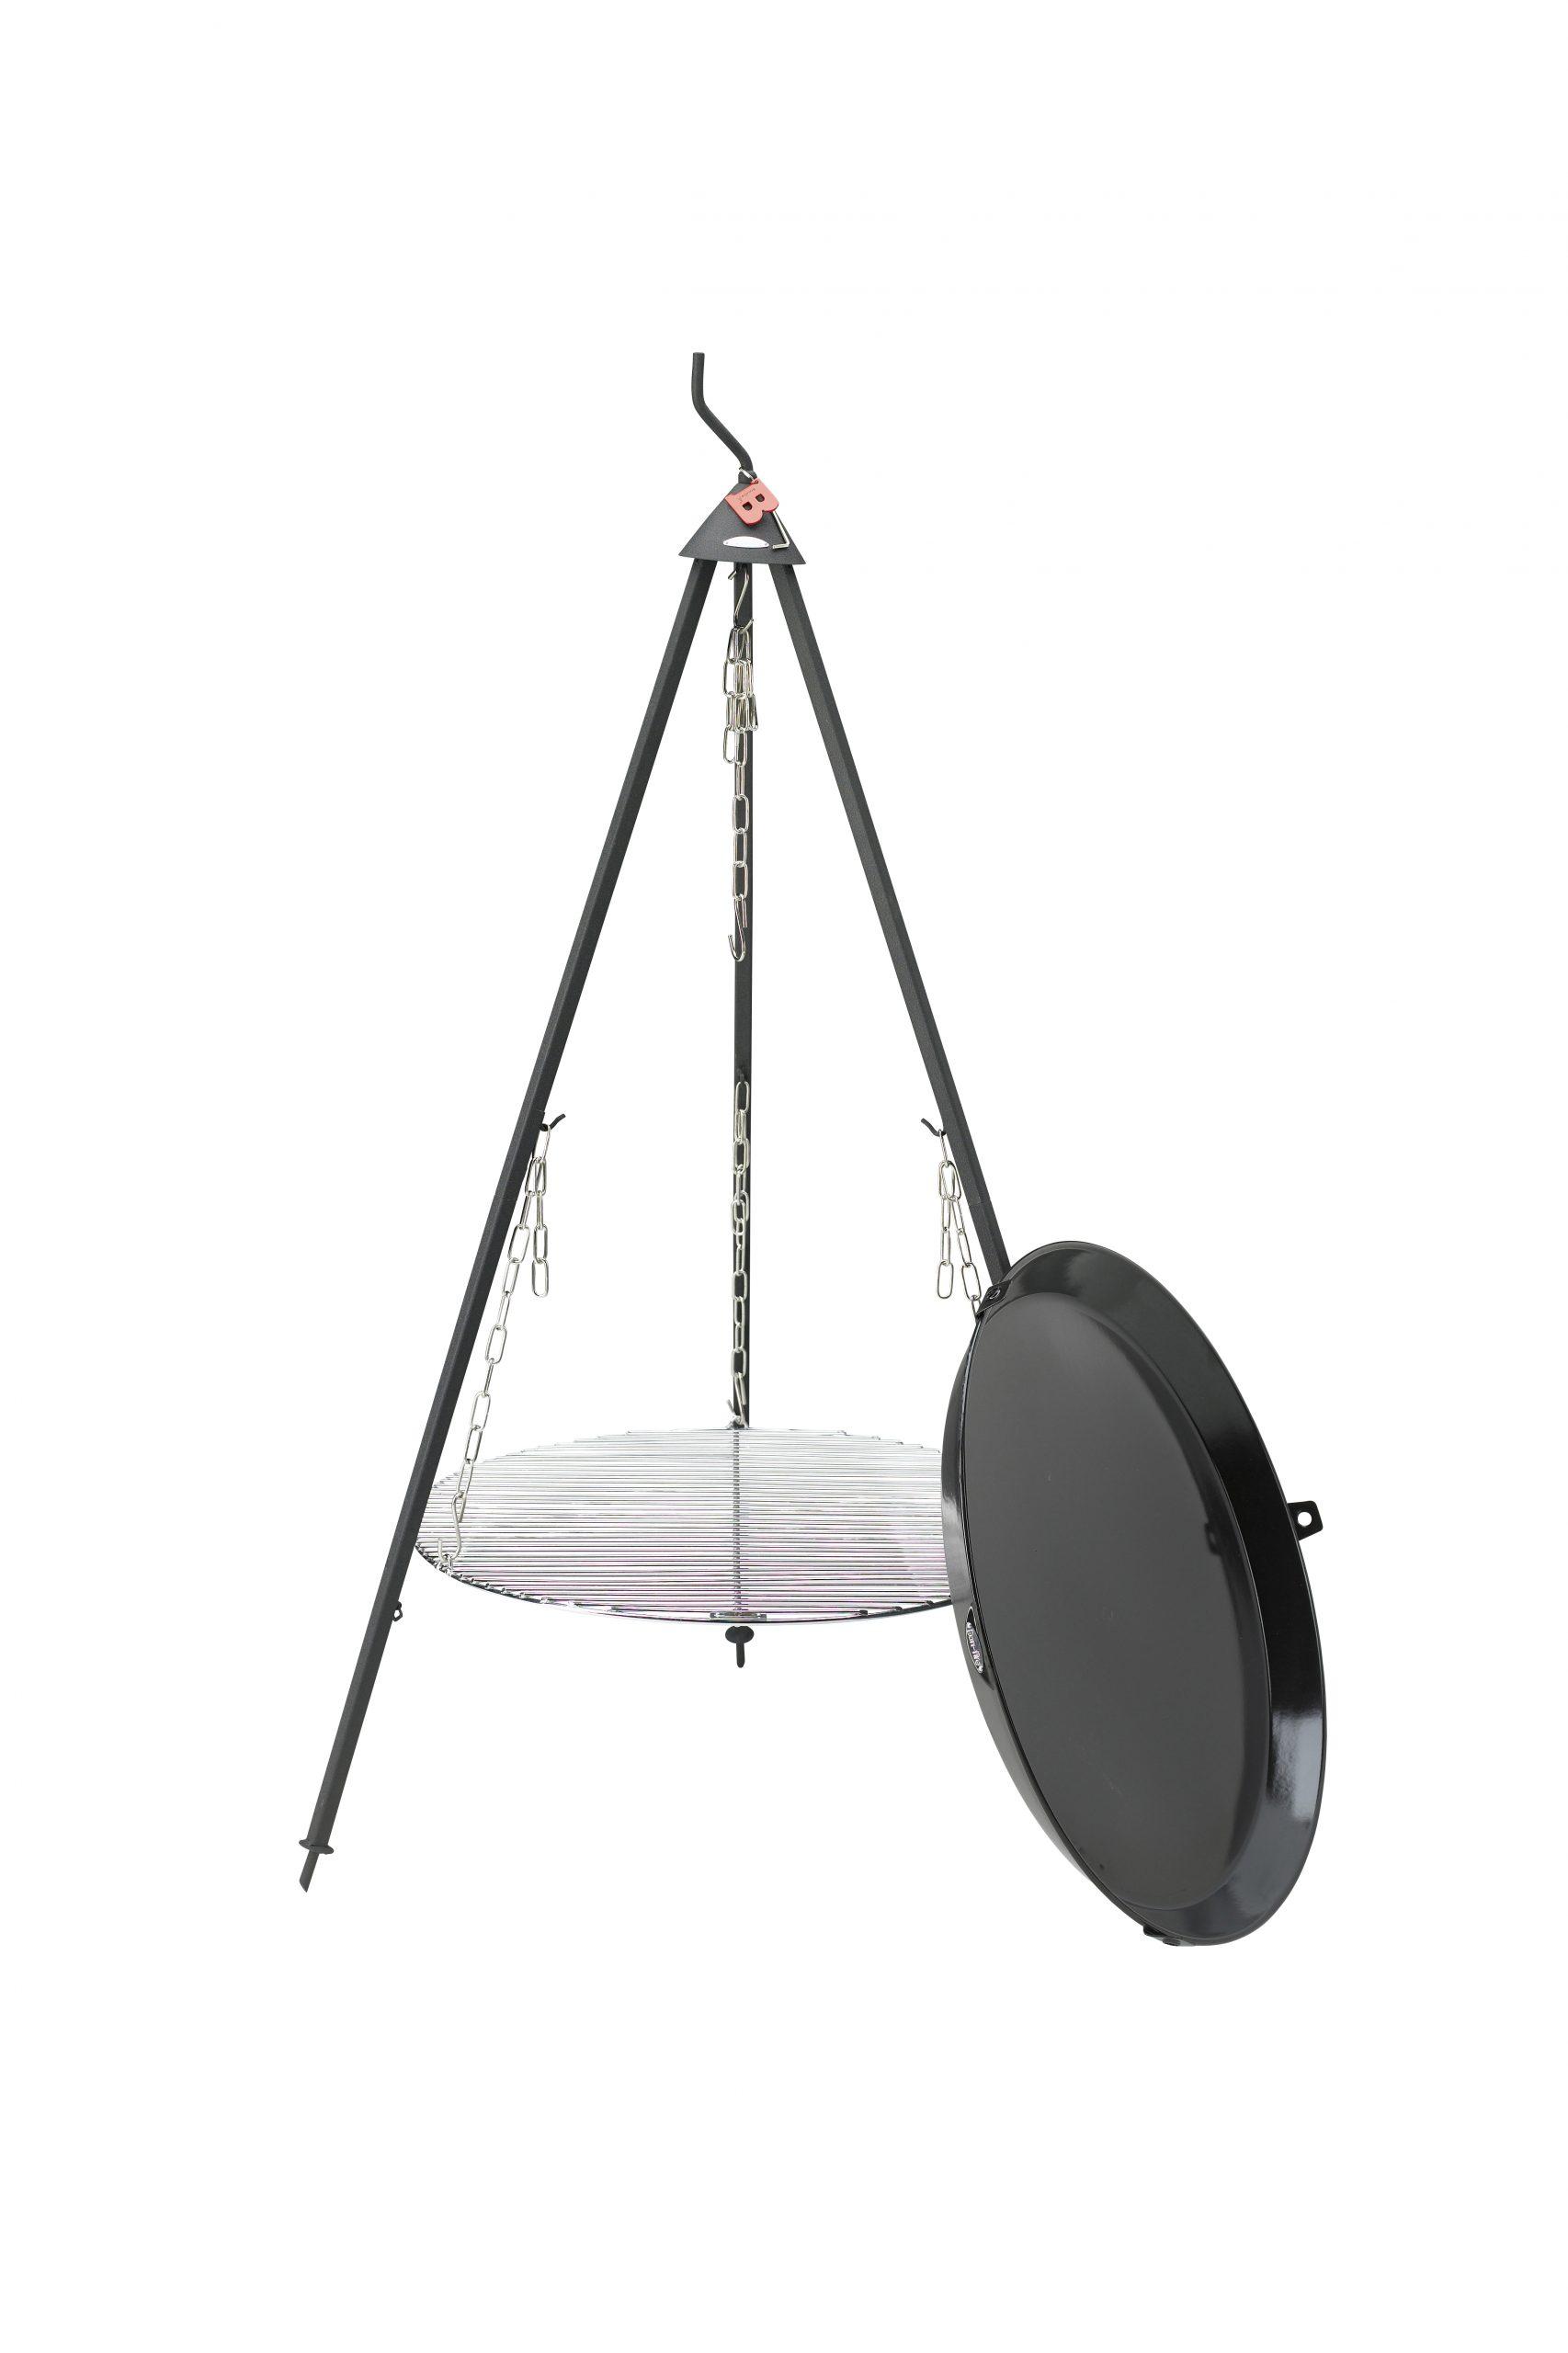 Bon-fire Basic set and BBQ pan.